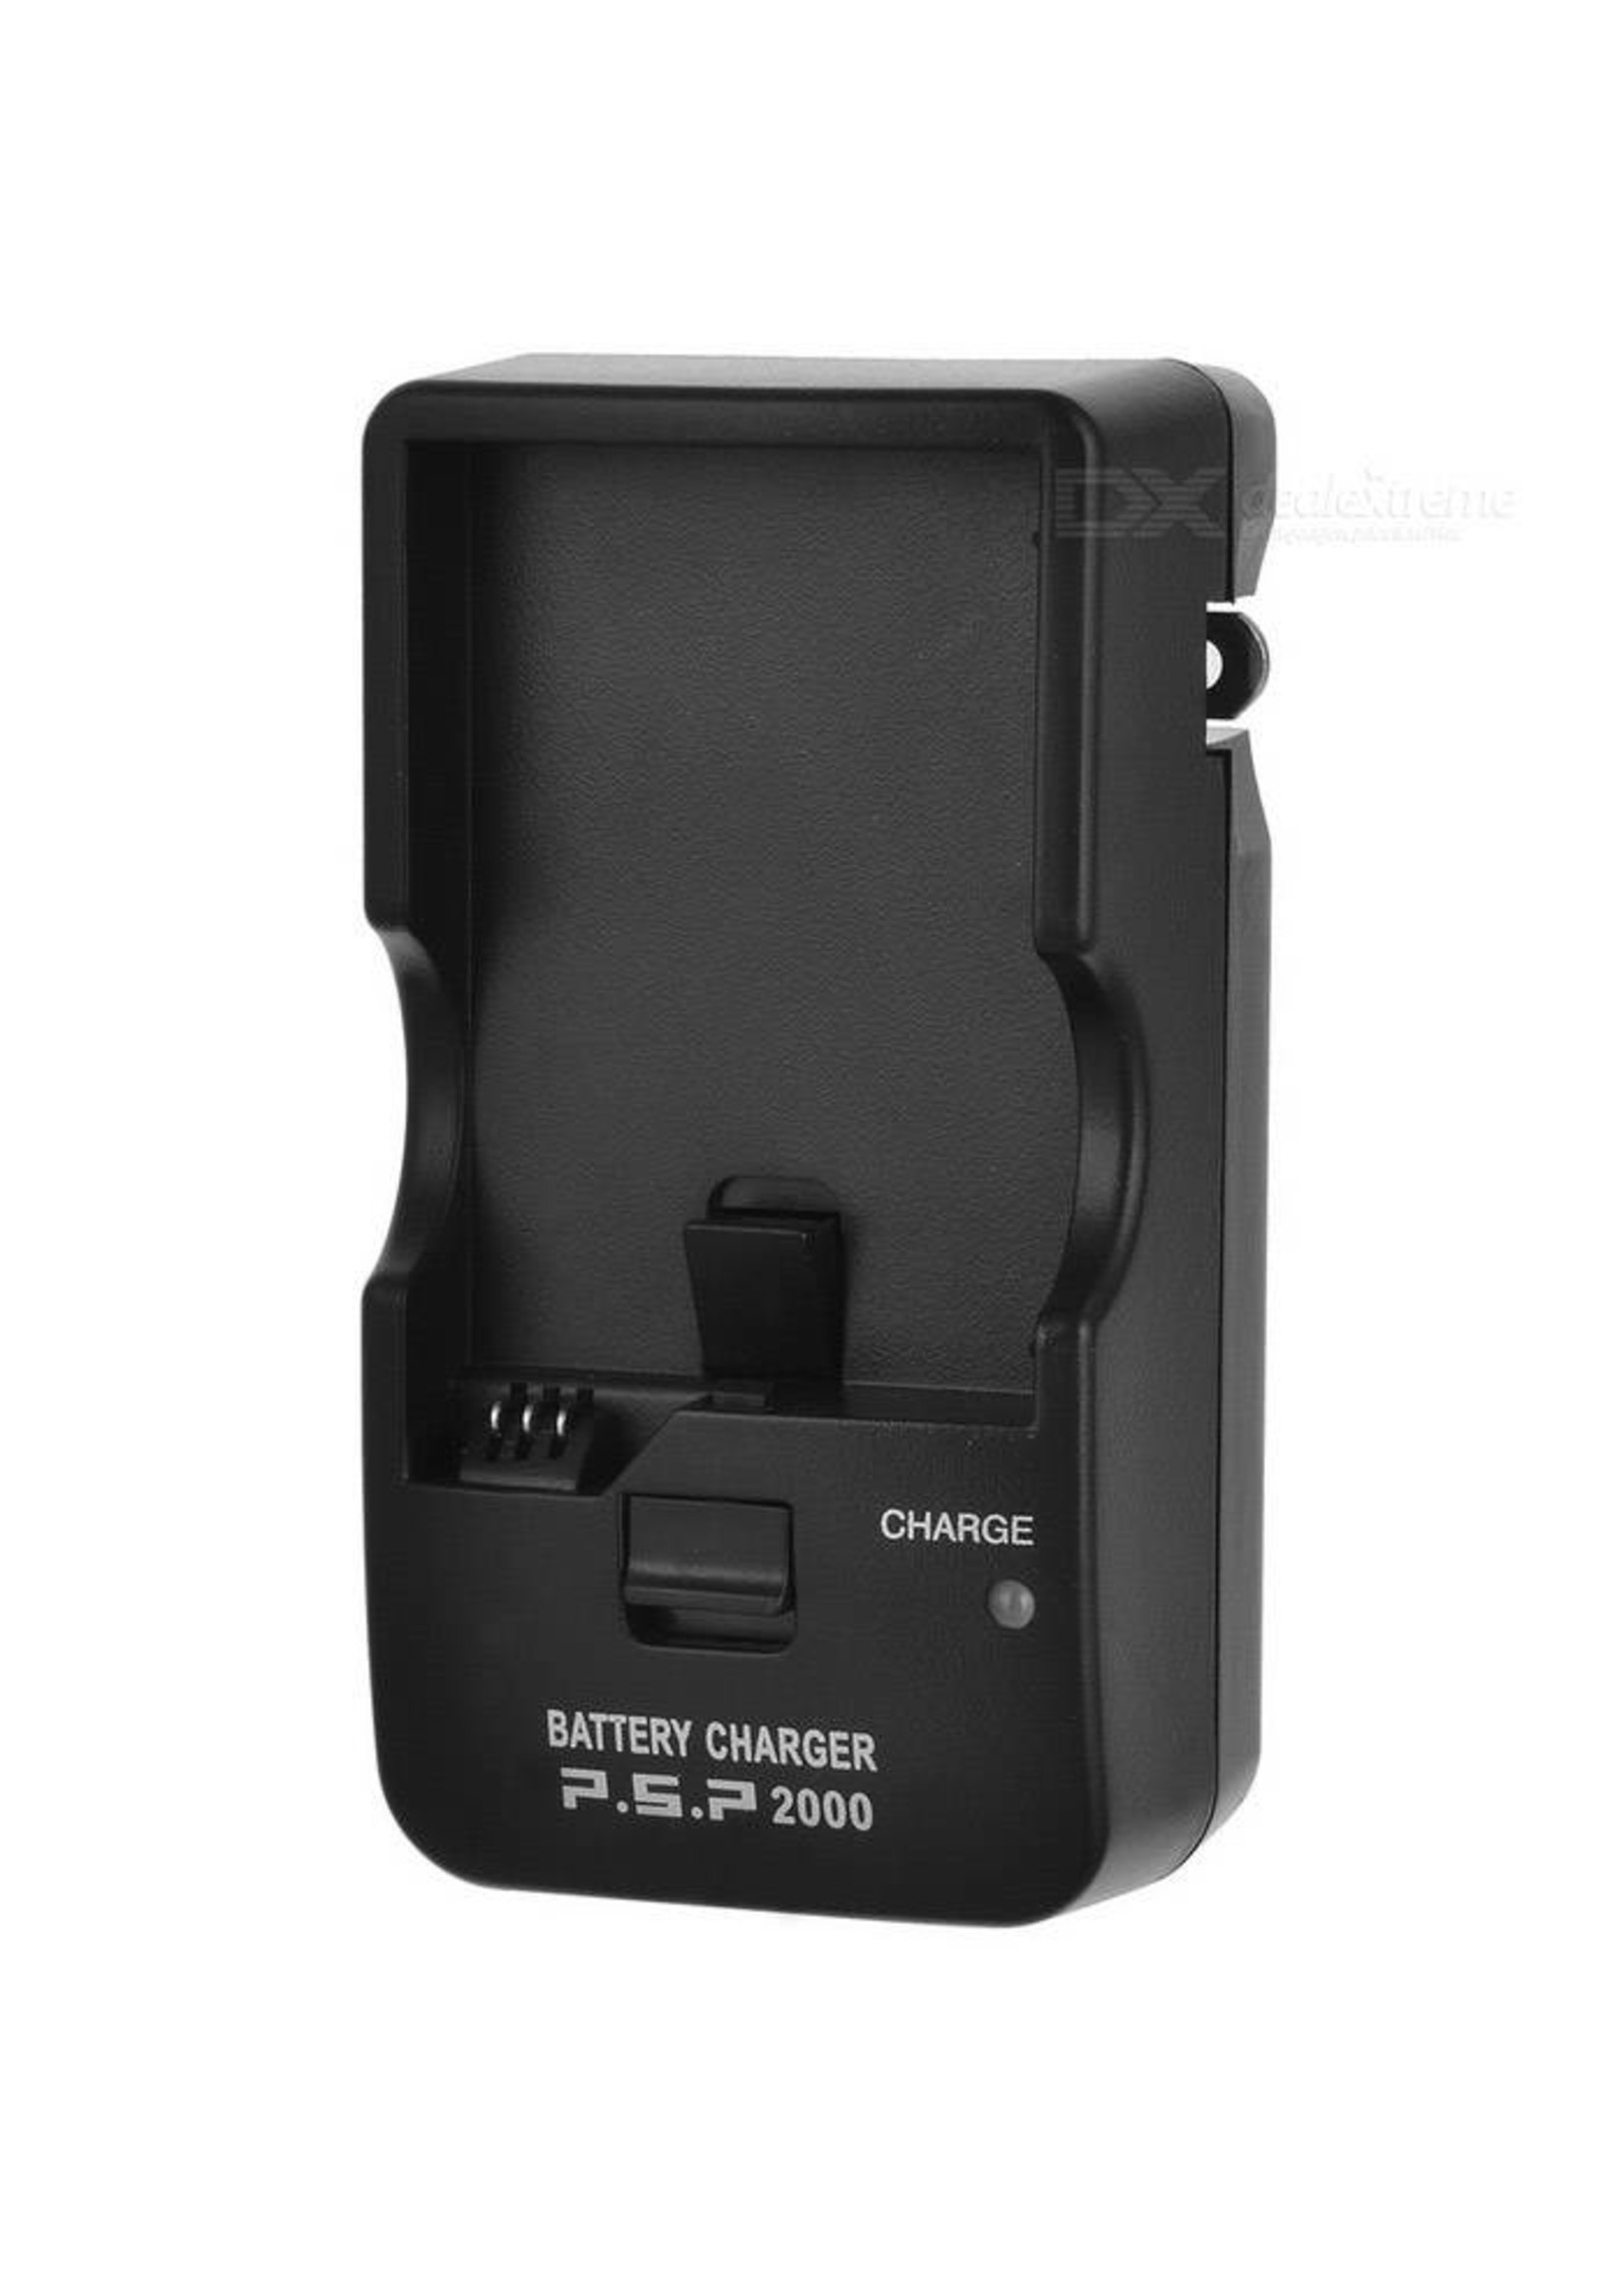 PSP External Battery Charger (No Box)